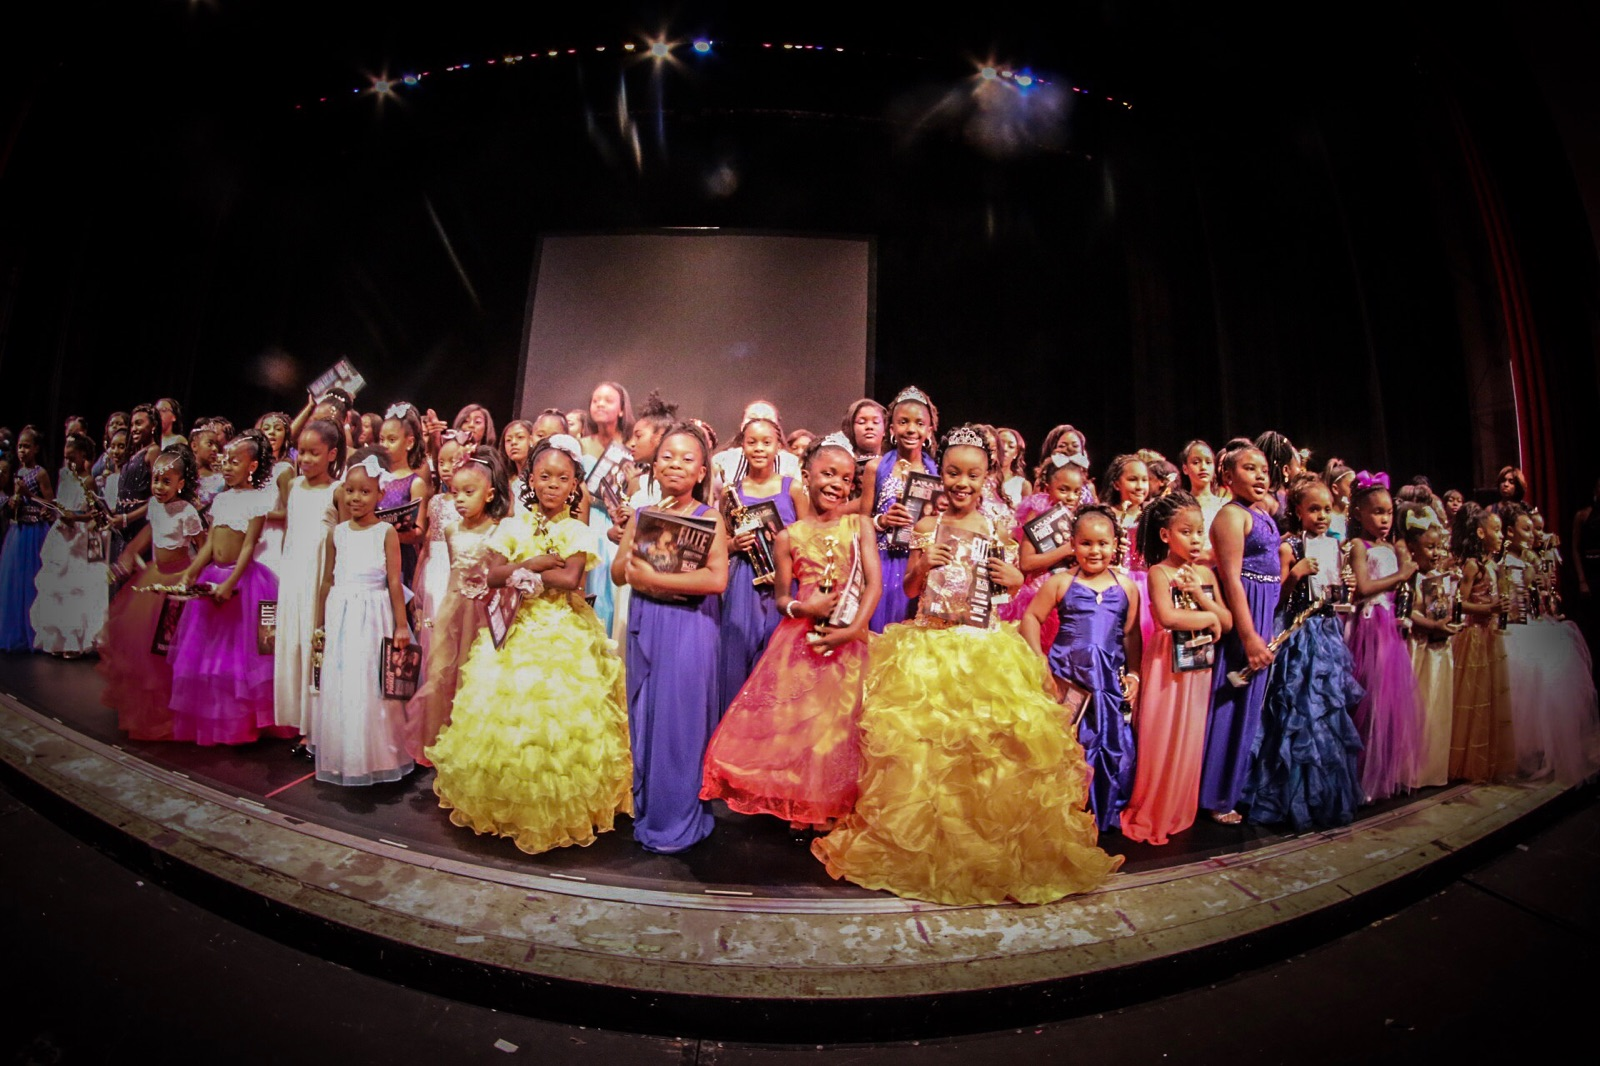 Elite Dance Line's Lit 16th Annual Celebration